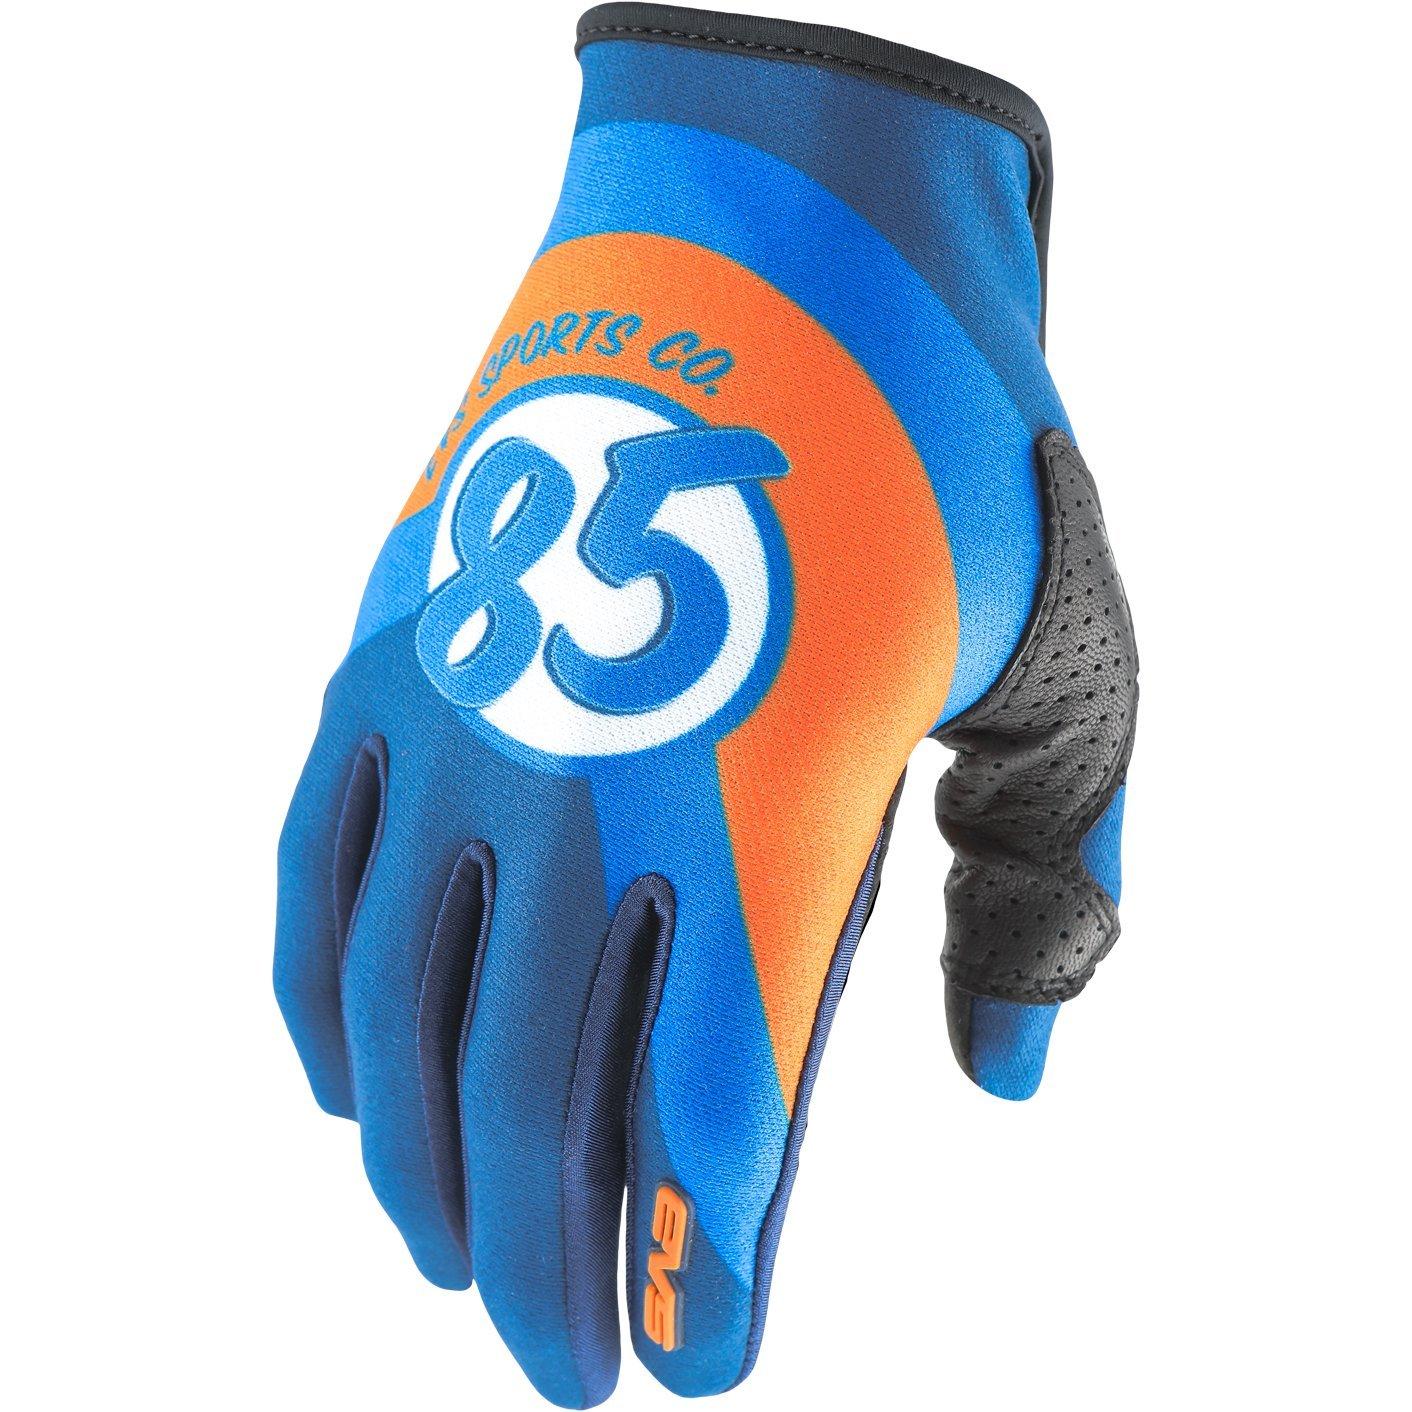 EVS Sports Unisex-Adult Slip On Glove Cosmic Dark Blue Medium GL18SOCO-DKBU-M